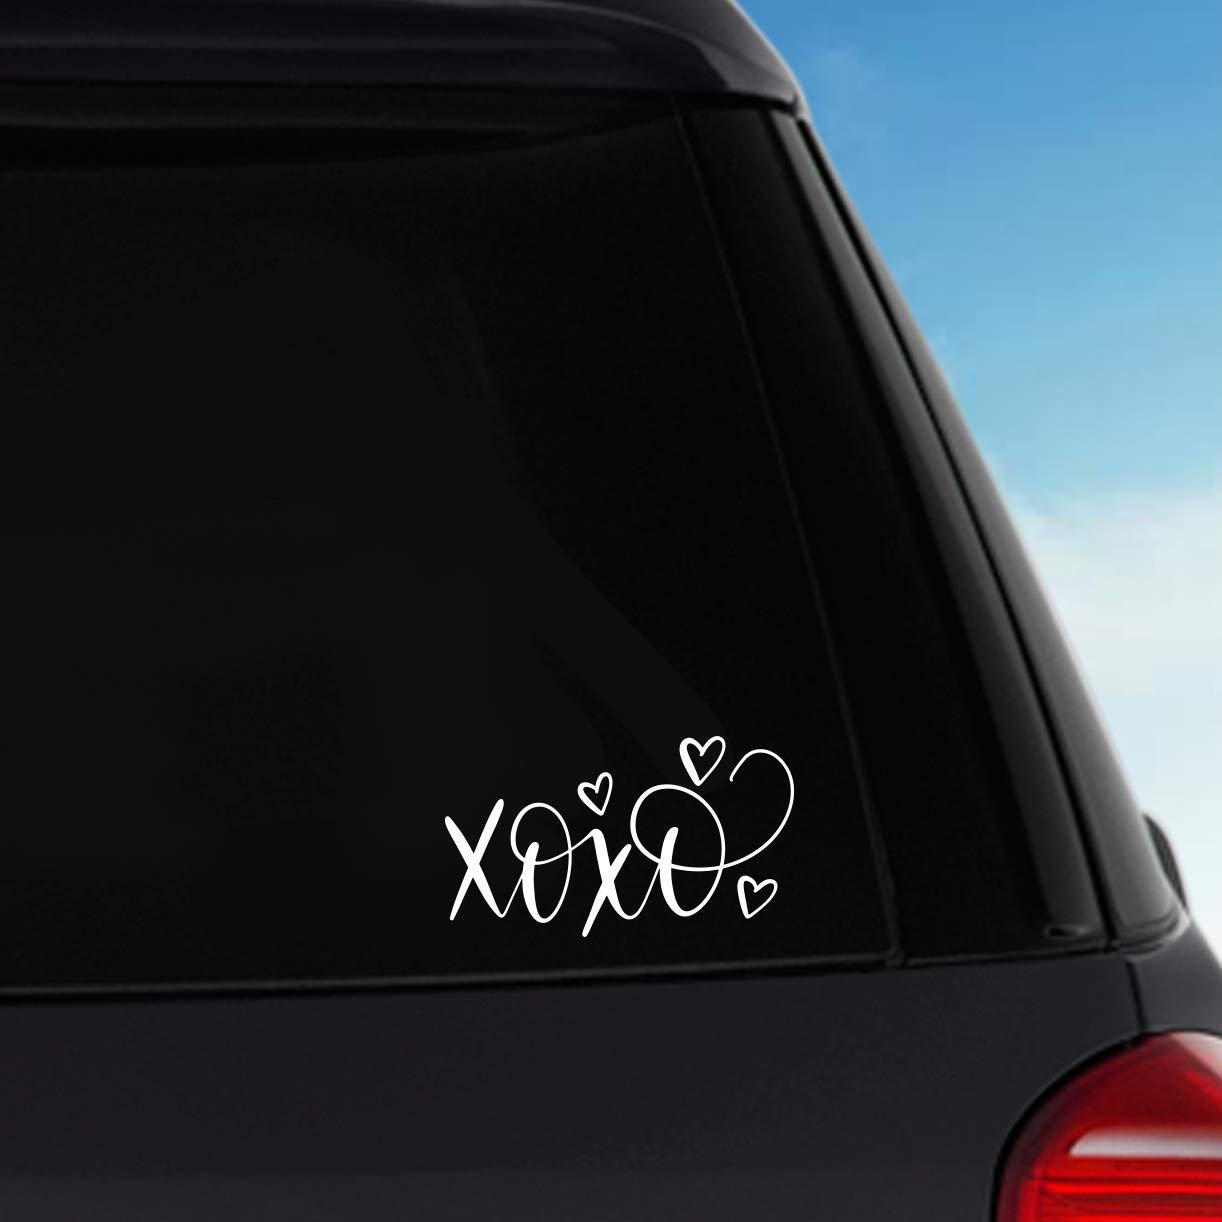 Laptop Decal XOXO Vinyl Sticker Decal Car Decal